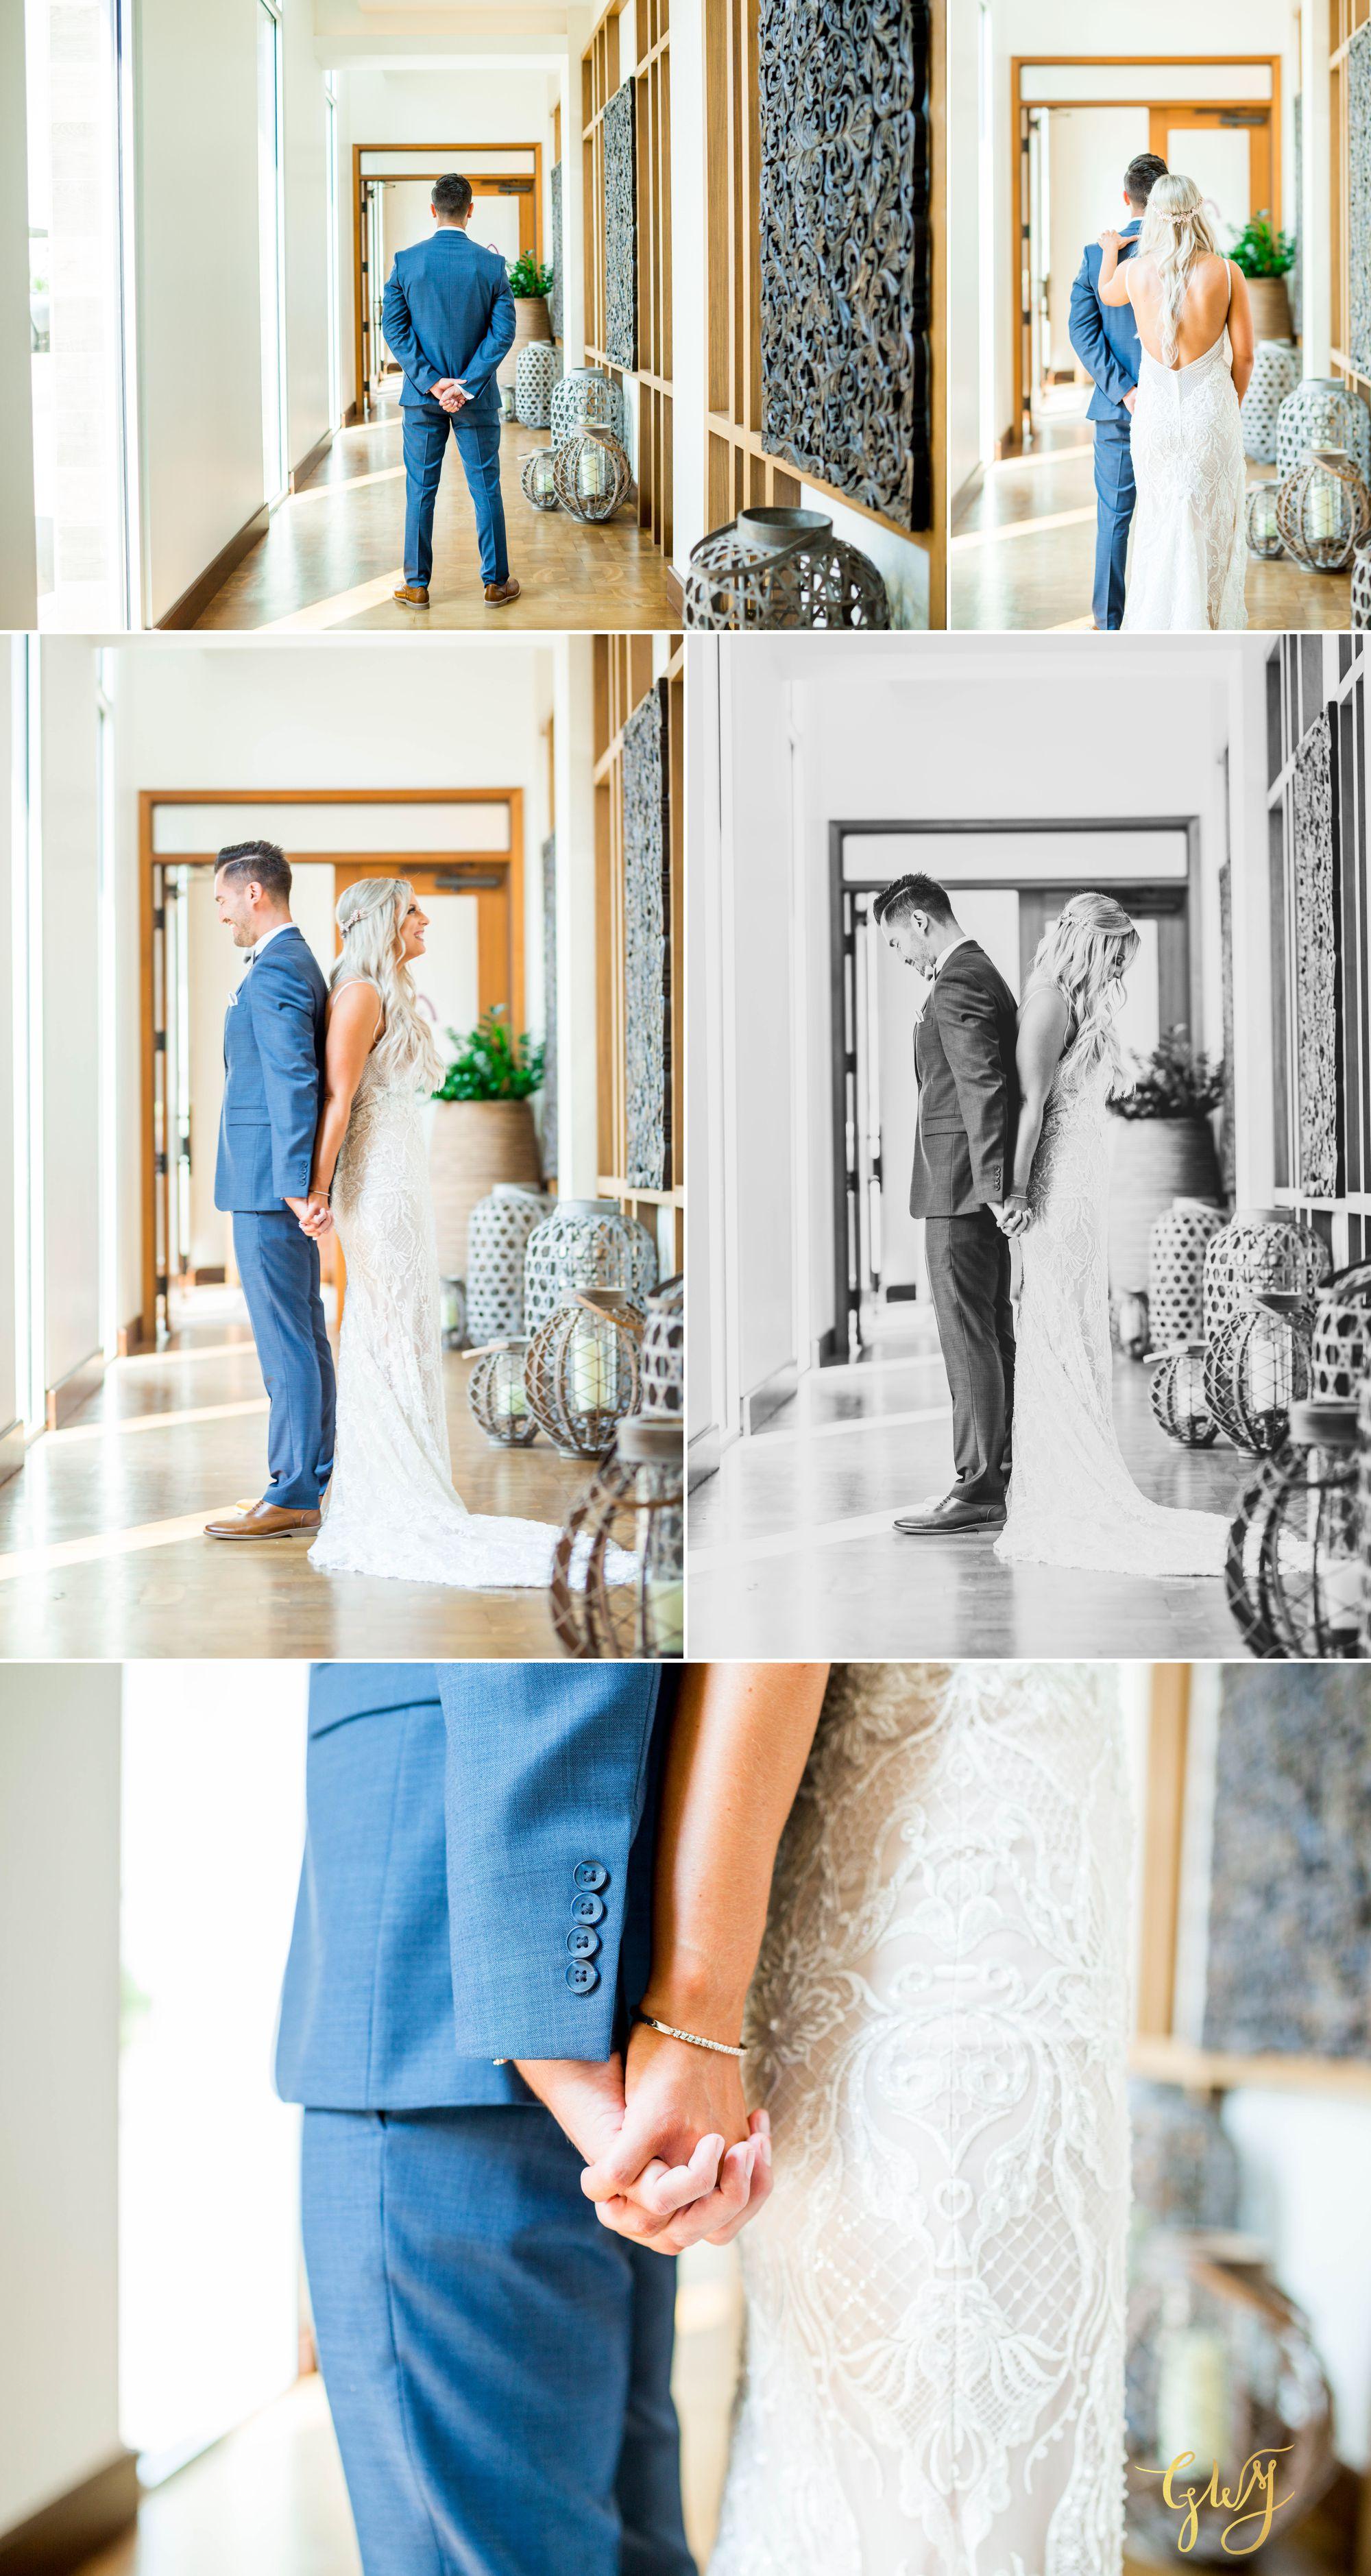 Christien + Crystal Pasea Hotel & Spa Huntington Beach Wedding by Glass Woods Media 26.jpg